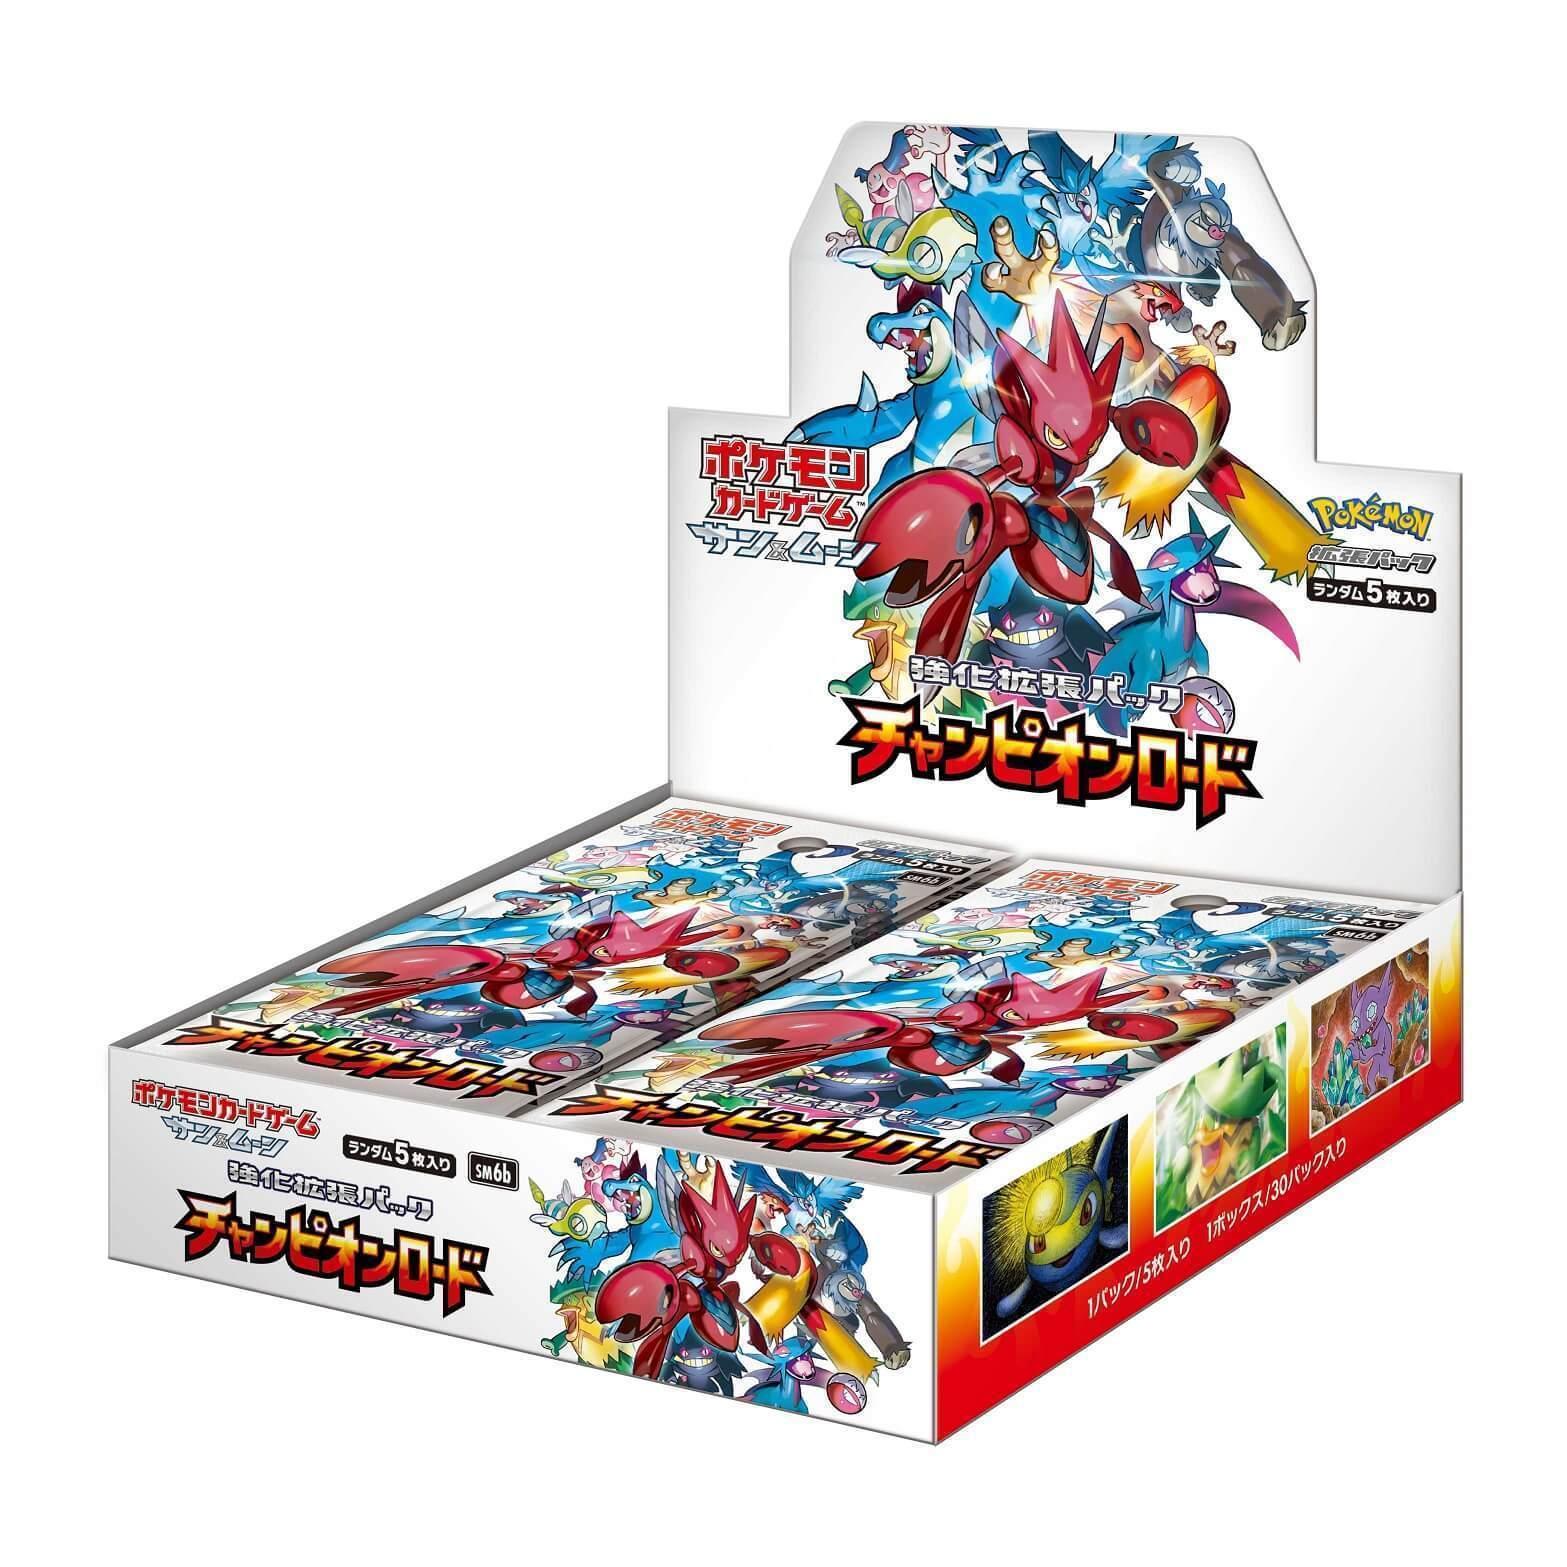 JAPANESE Pokemon Champion Road SM6b + Dragon Storm SM6a Booster Boxes Sun & Moon image 2